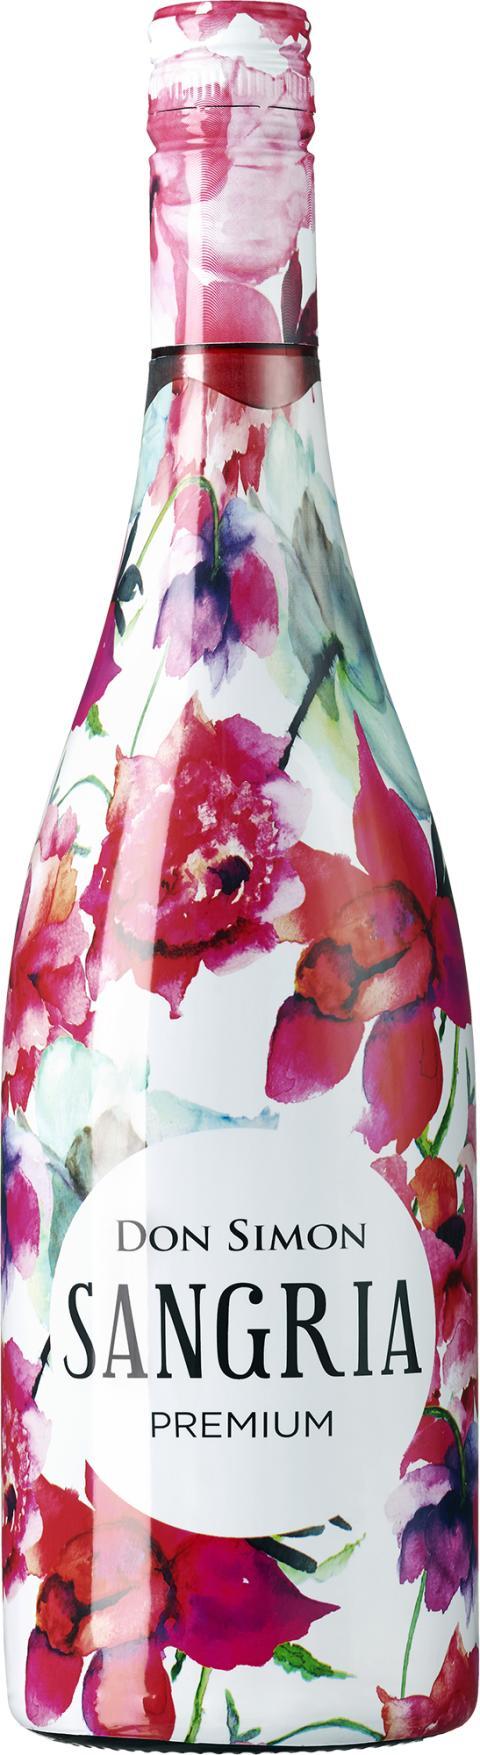 Don Simon Premium Sangria, flaskbild